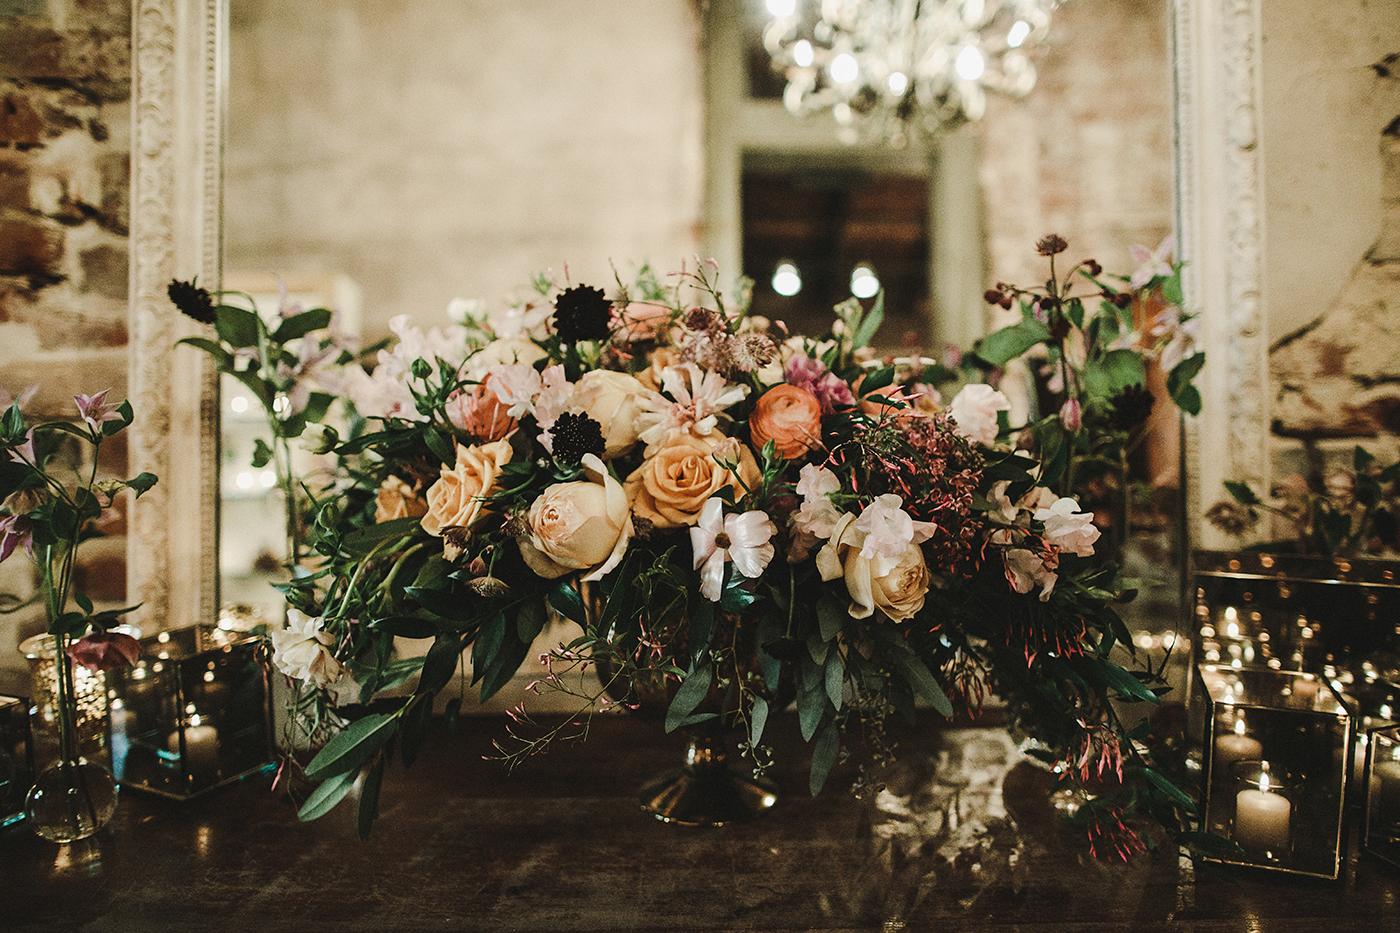 Autumnal floral arrangement by Kim Starr Wise